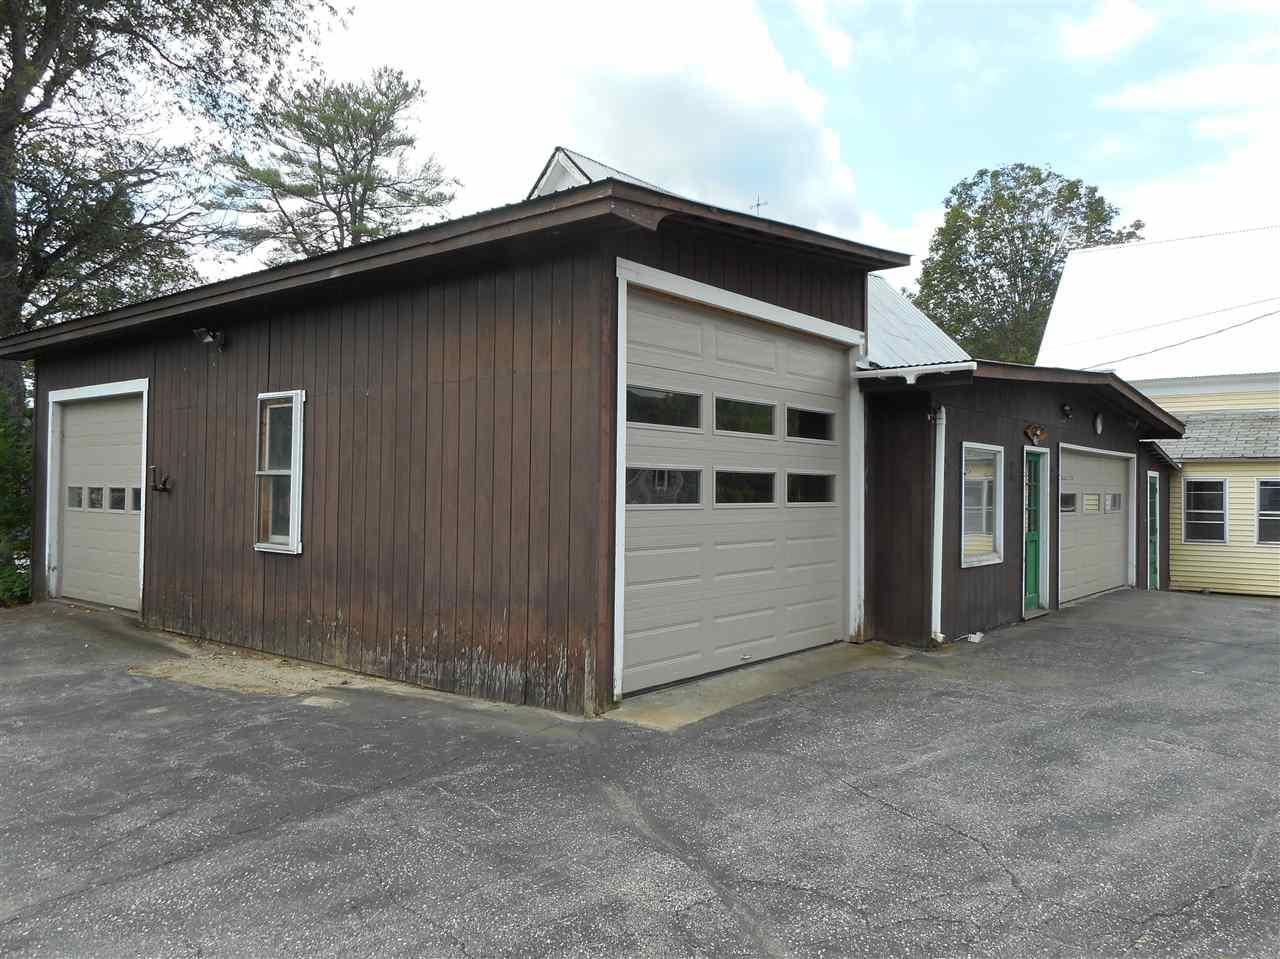 Vermont-Real-Estate-4651704-24